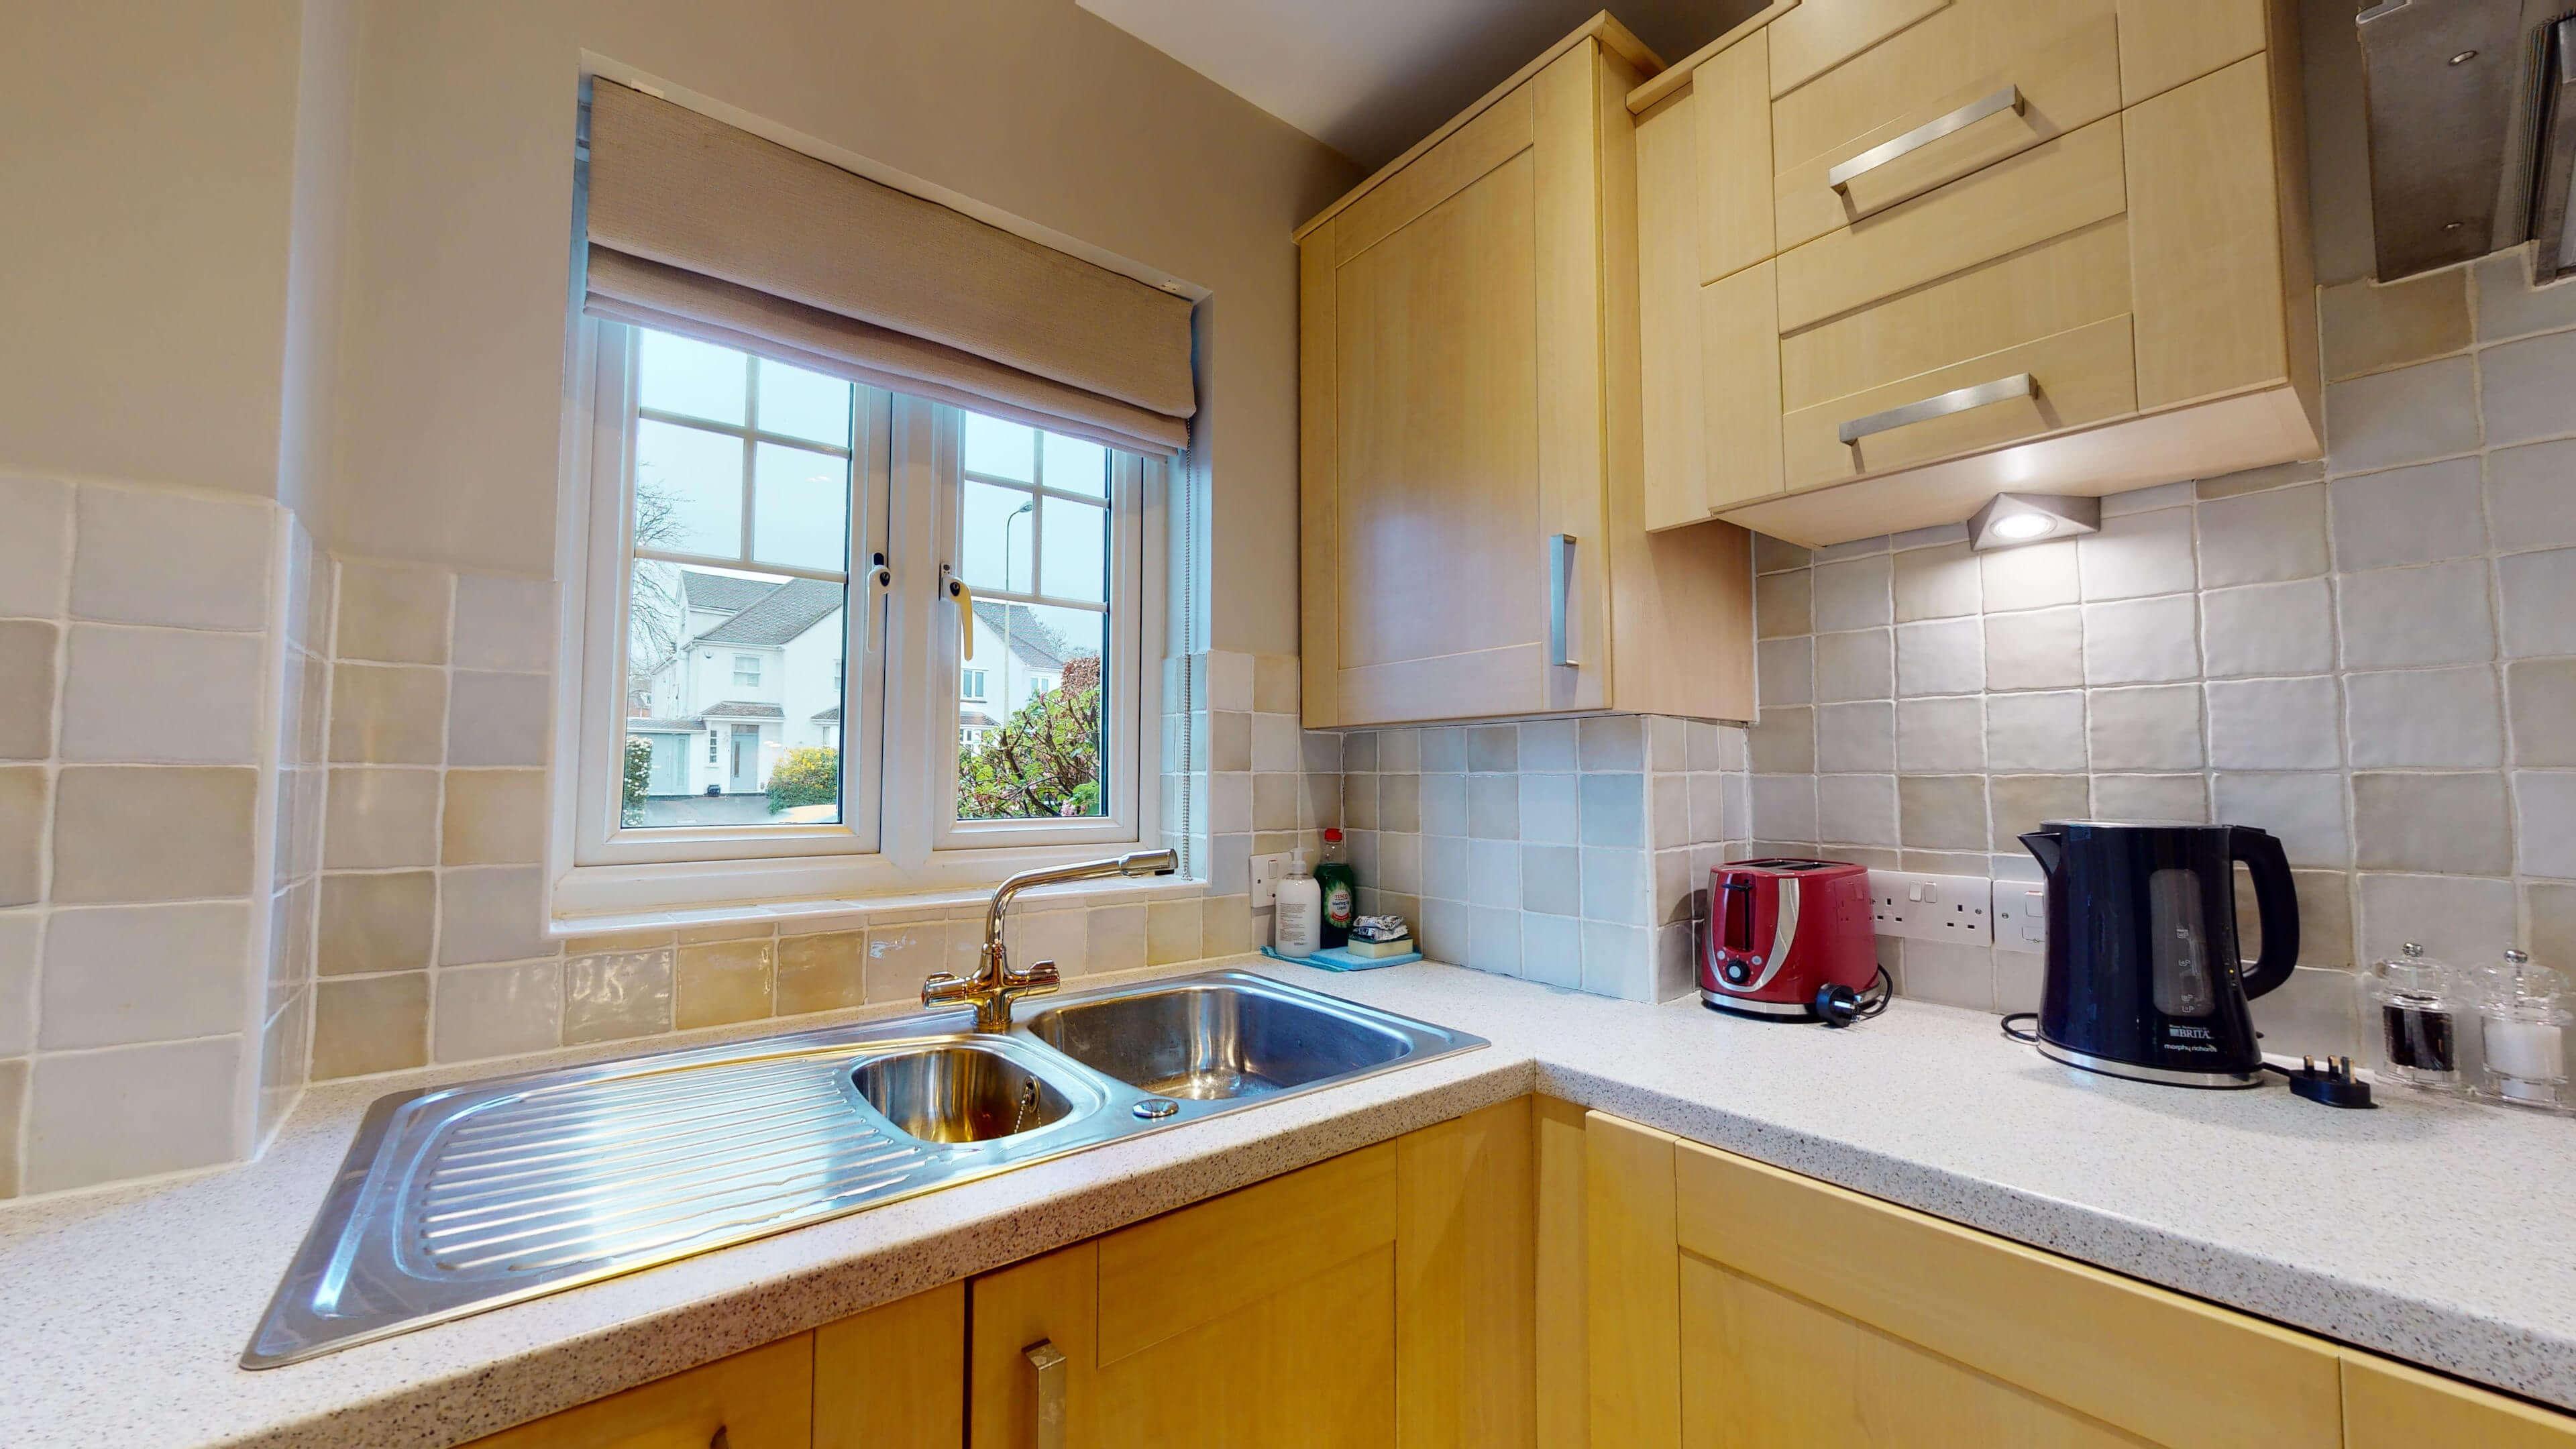 Oxford Serviced Apartment Blenheim Suite Kitchen